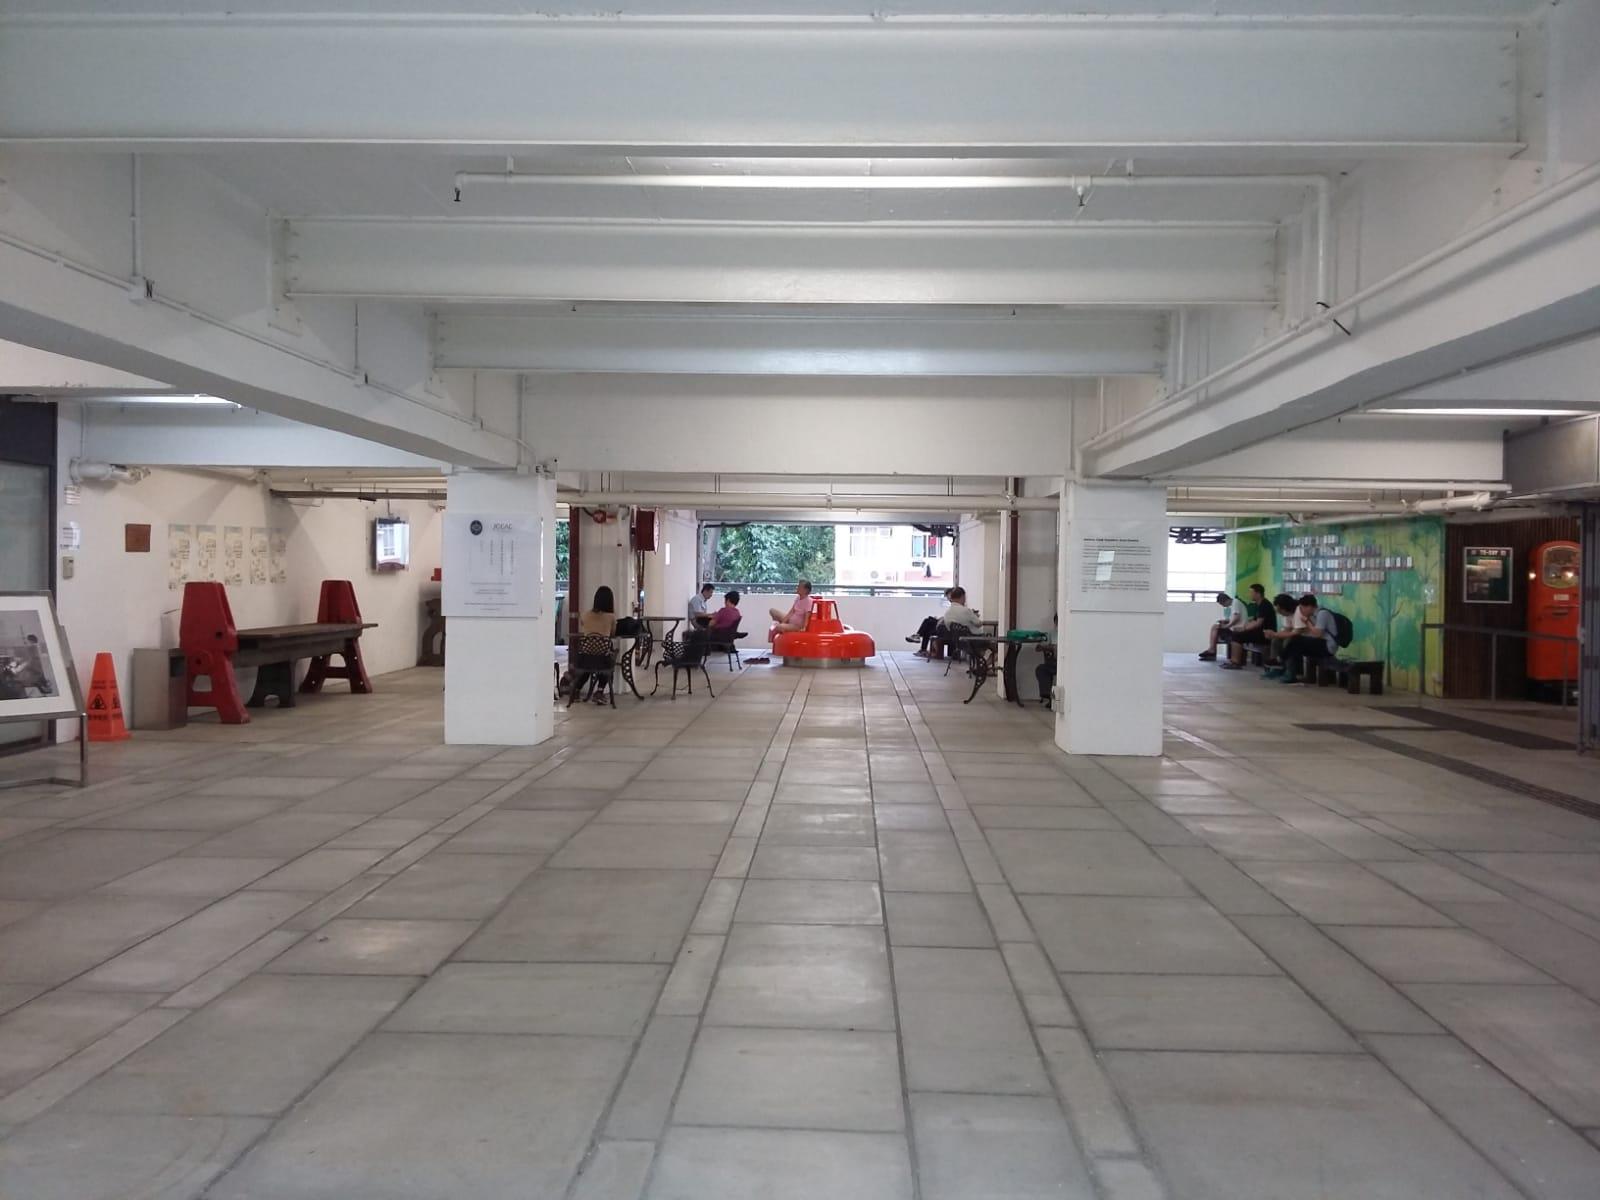 Jockey_Club_Arts_Centre_Interior_HongKong